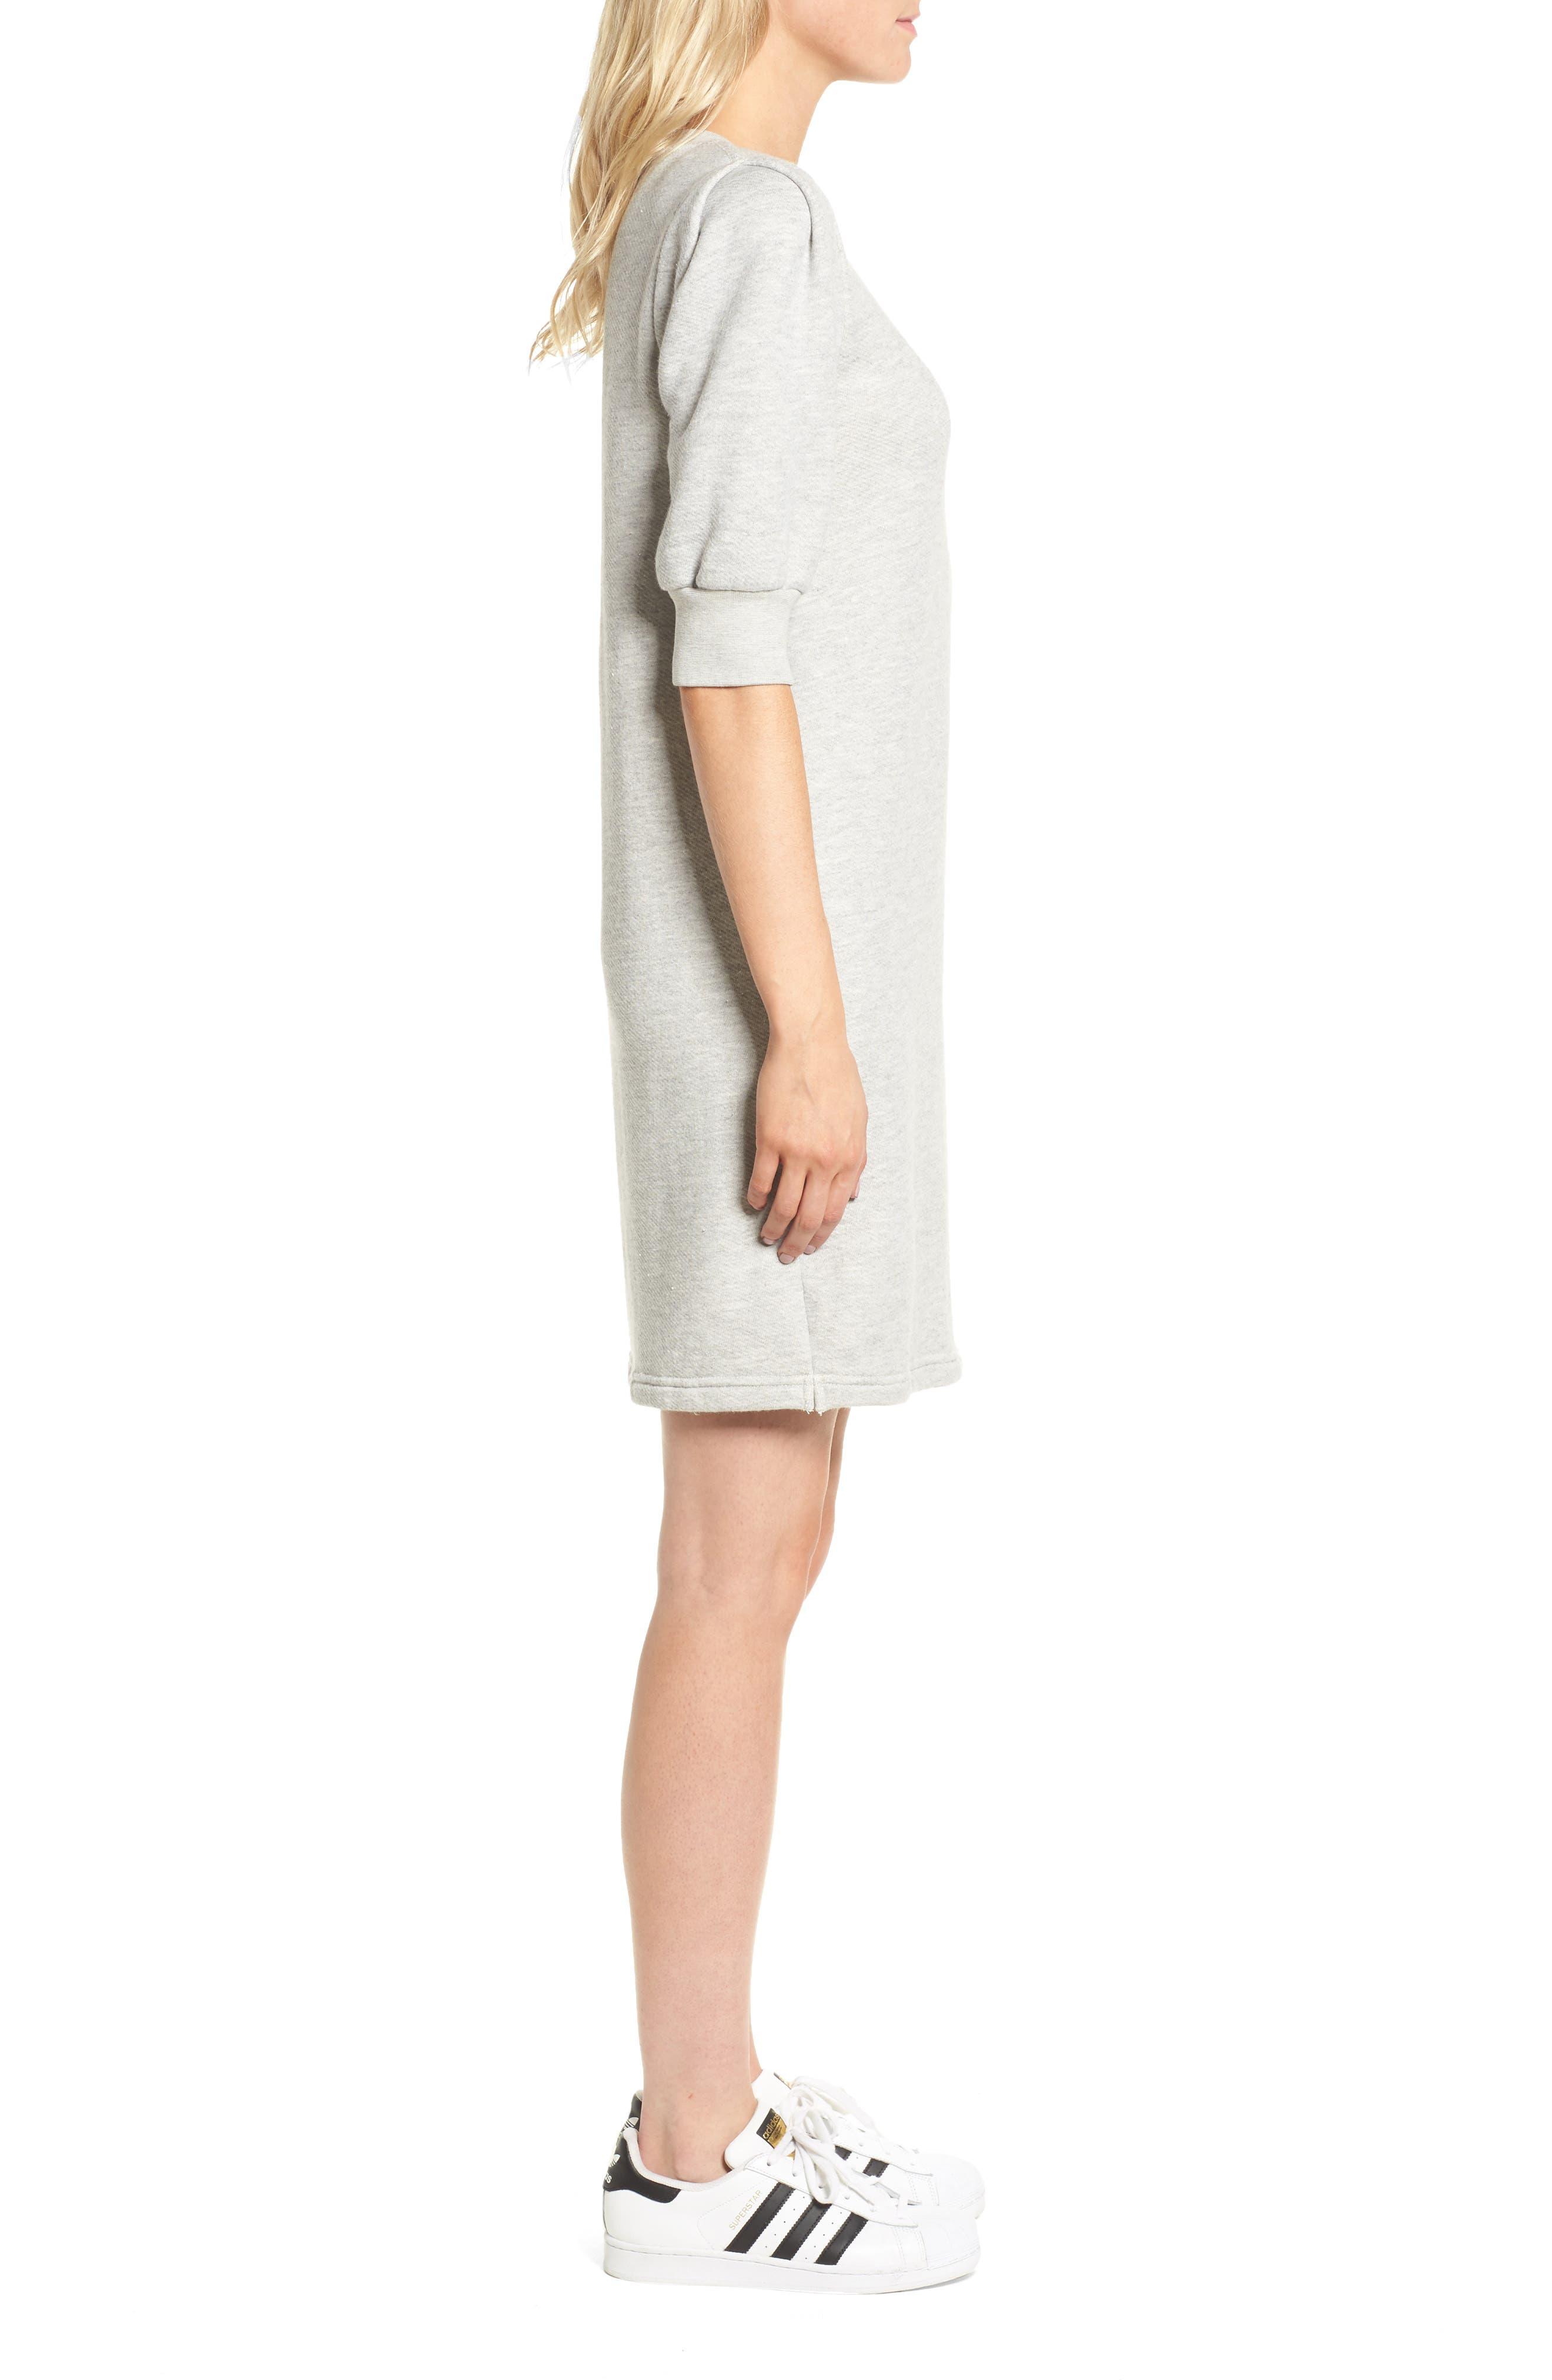 The Pleat Sweatshirt Dress,                             Alternate thumbnail 3, color,                             Light Heather Grey Terry